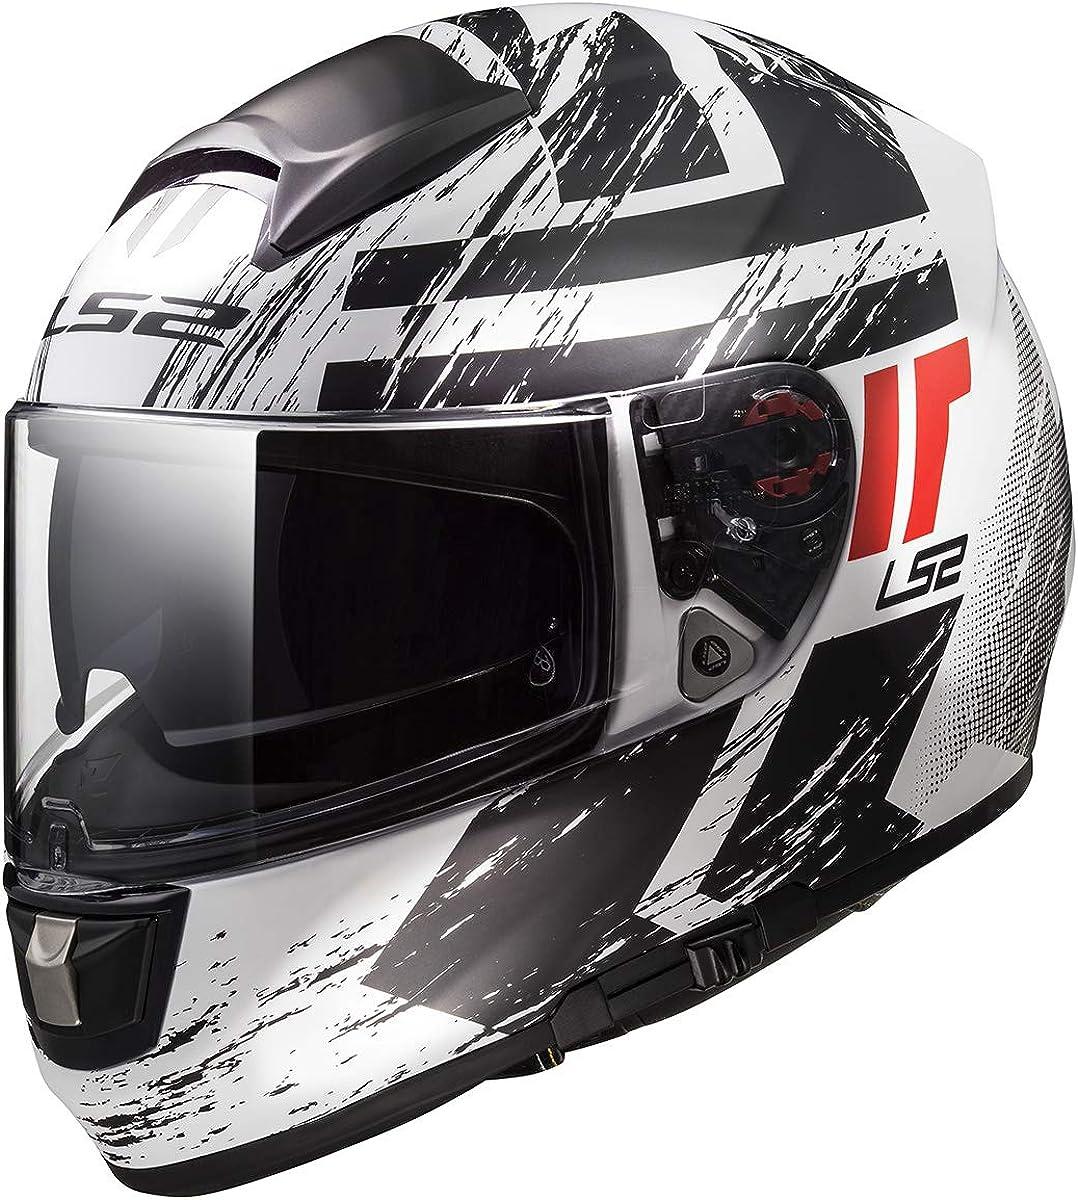 Online New mail order limited product LS2 Helmets Full Face Street Citation Helmet Evo